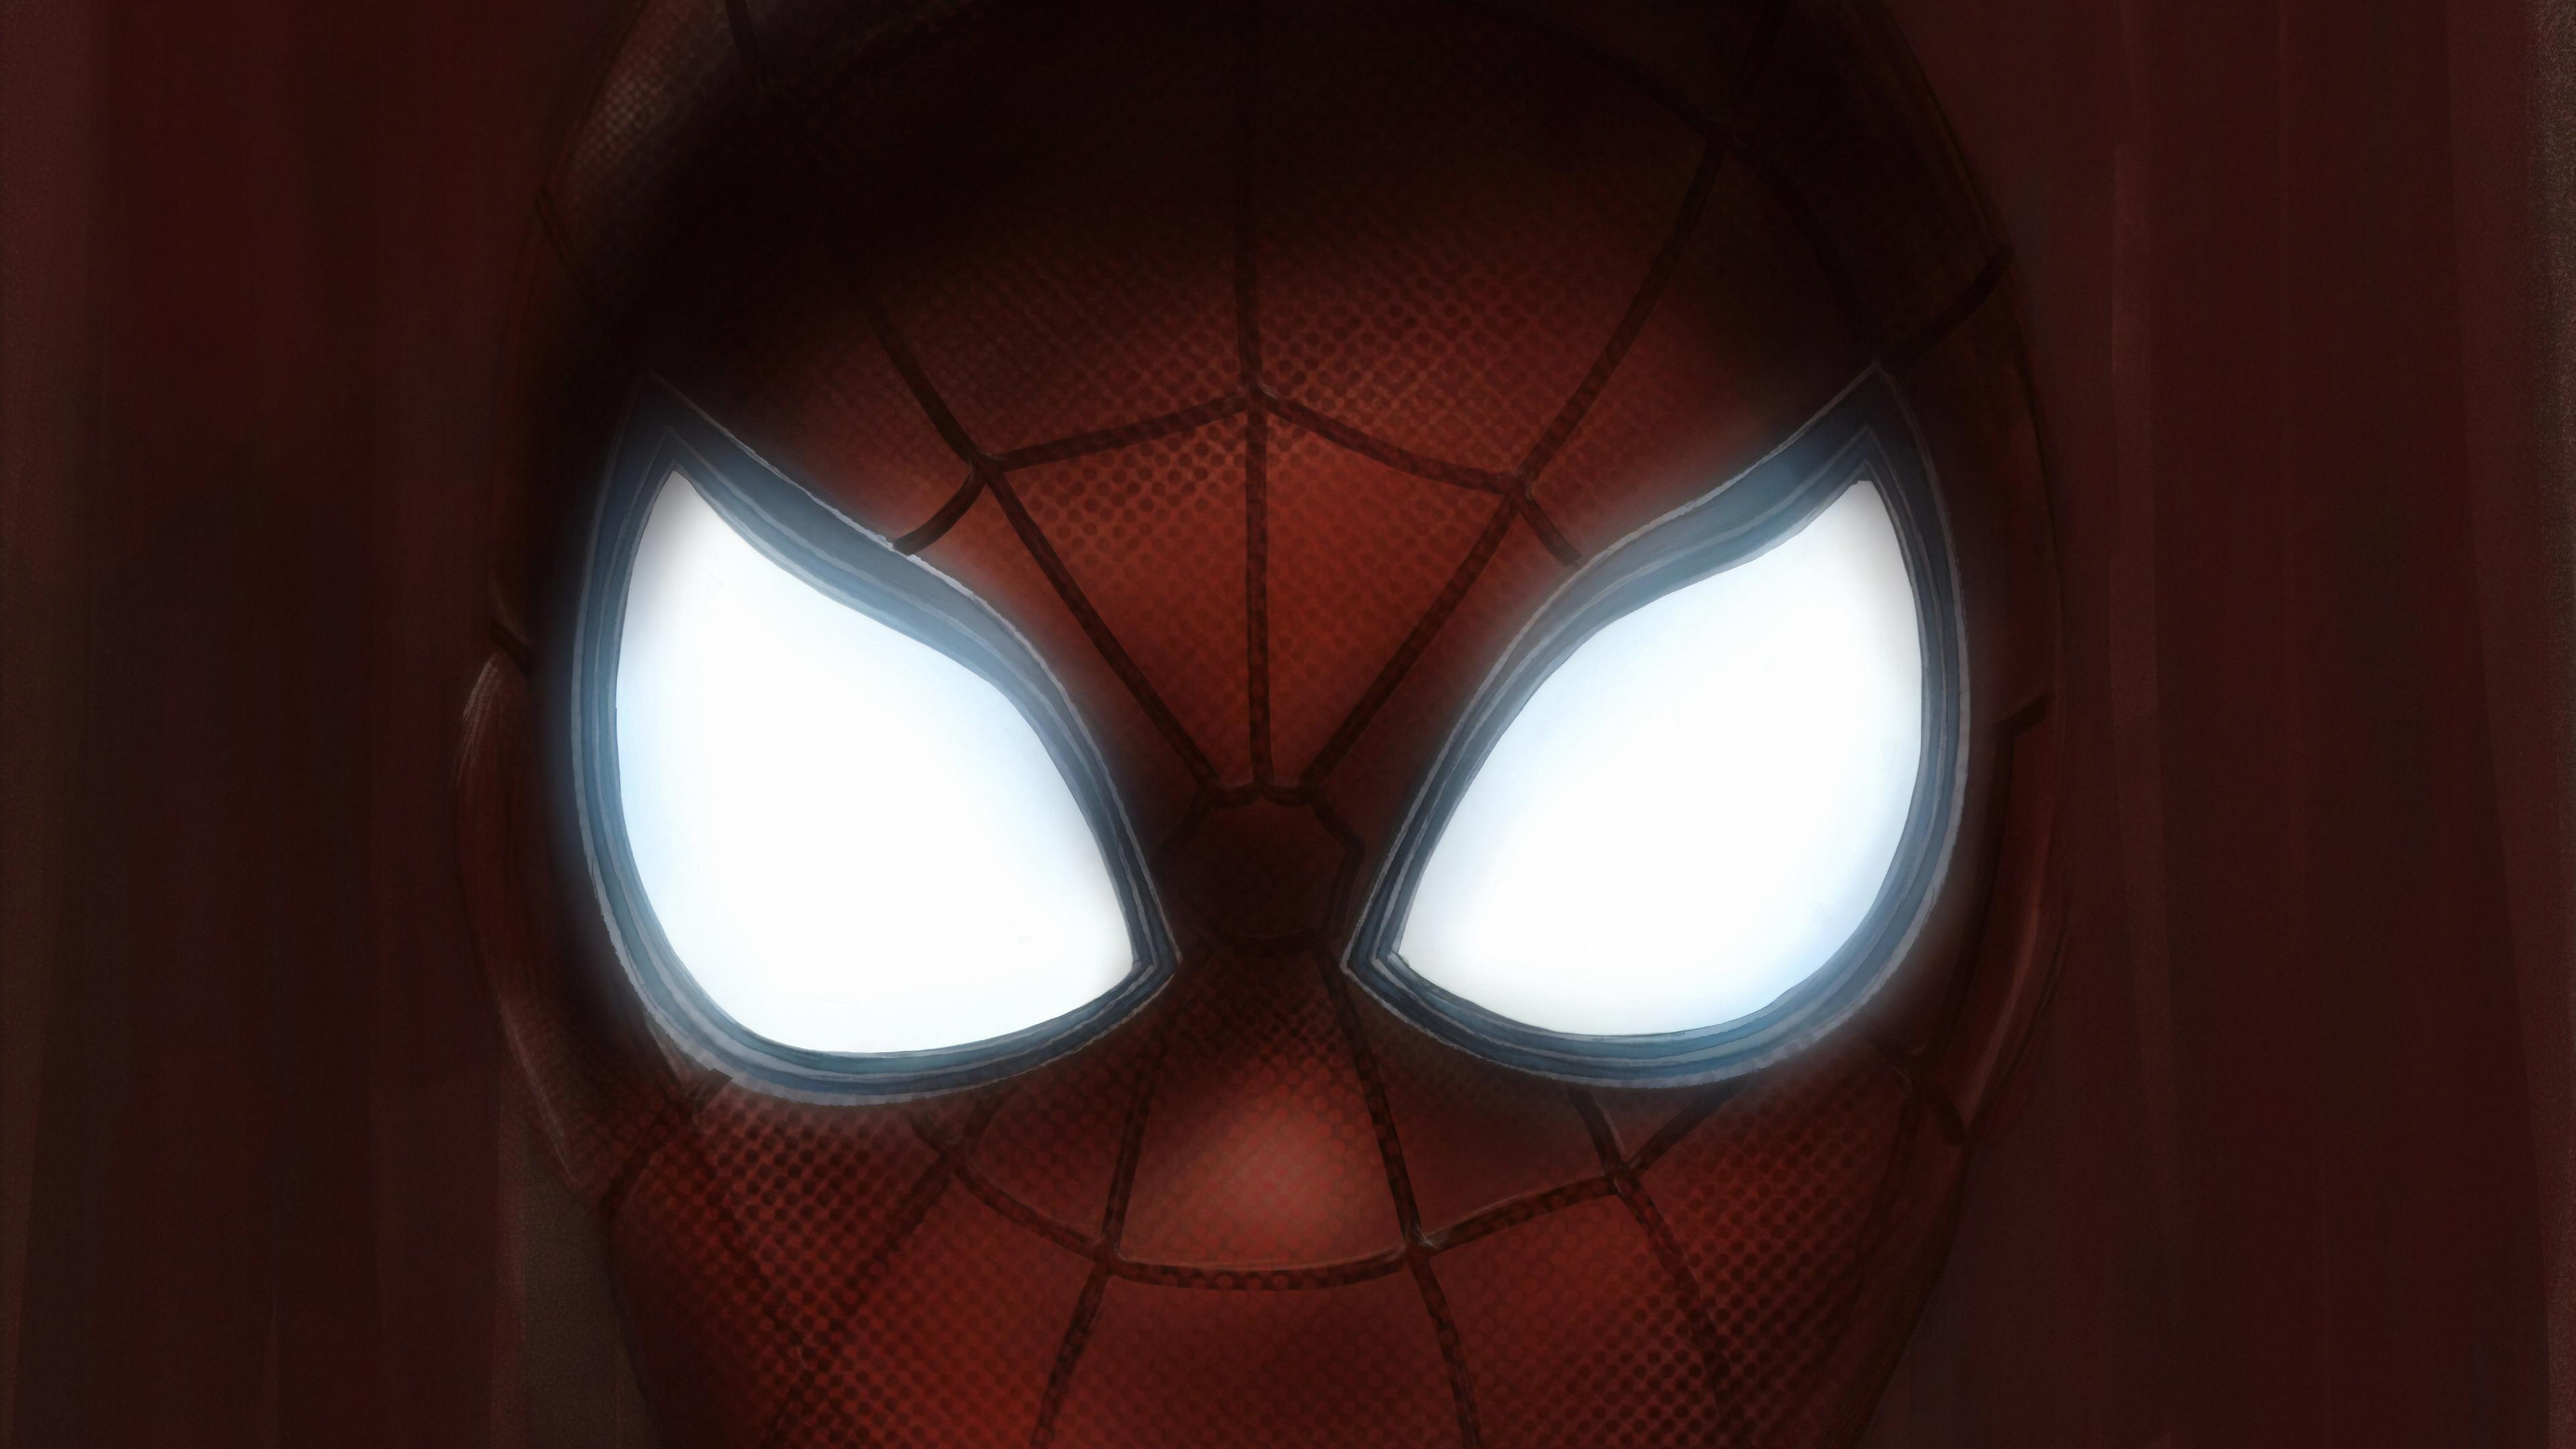 spiderman mask eyes 1570394567 - Spiderman Mask Eyes - superheroes wallpapers, spiderman wallpapers, hd-wallpapers, digital art wallpapers, artwork wallpapers, artstation wallpapers, art wallpapers, 4k-wallpapers